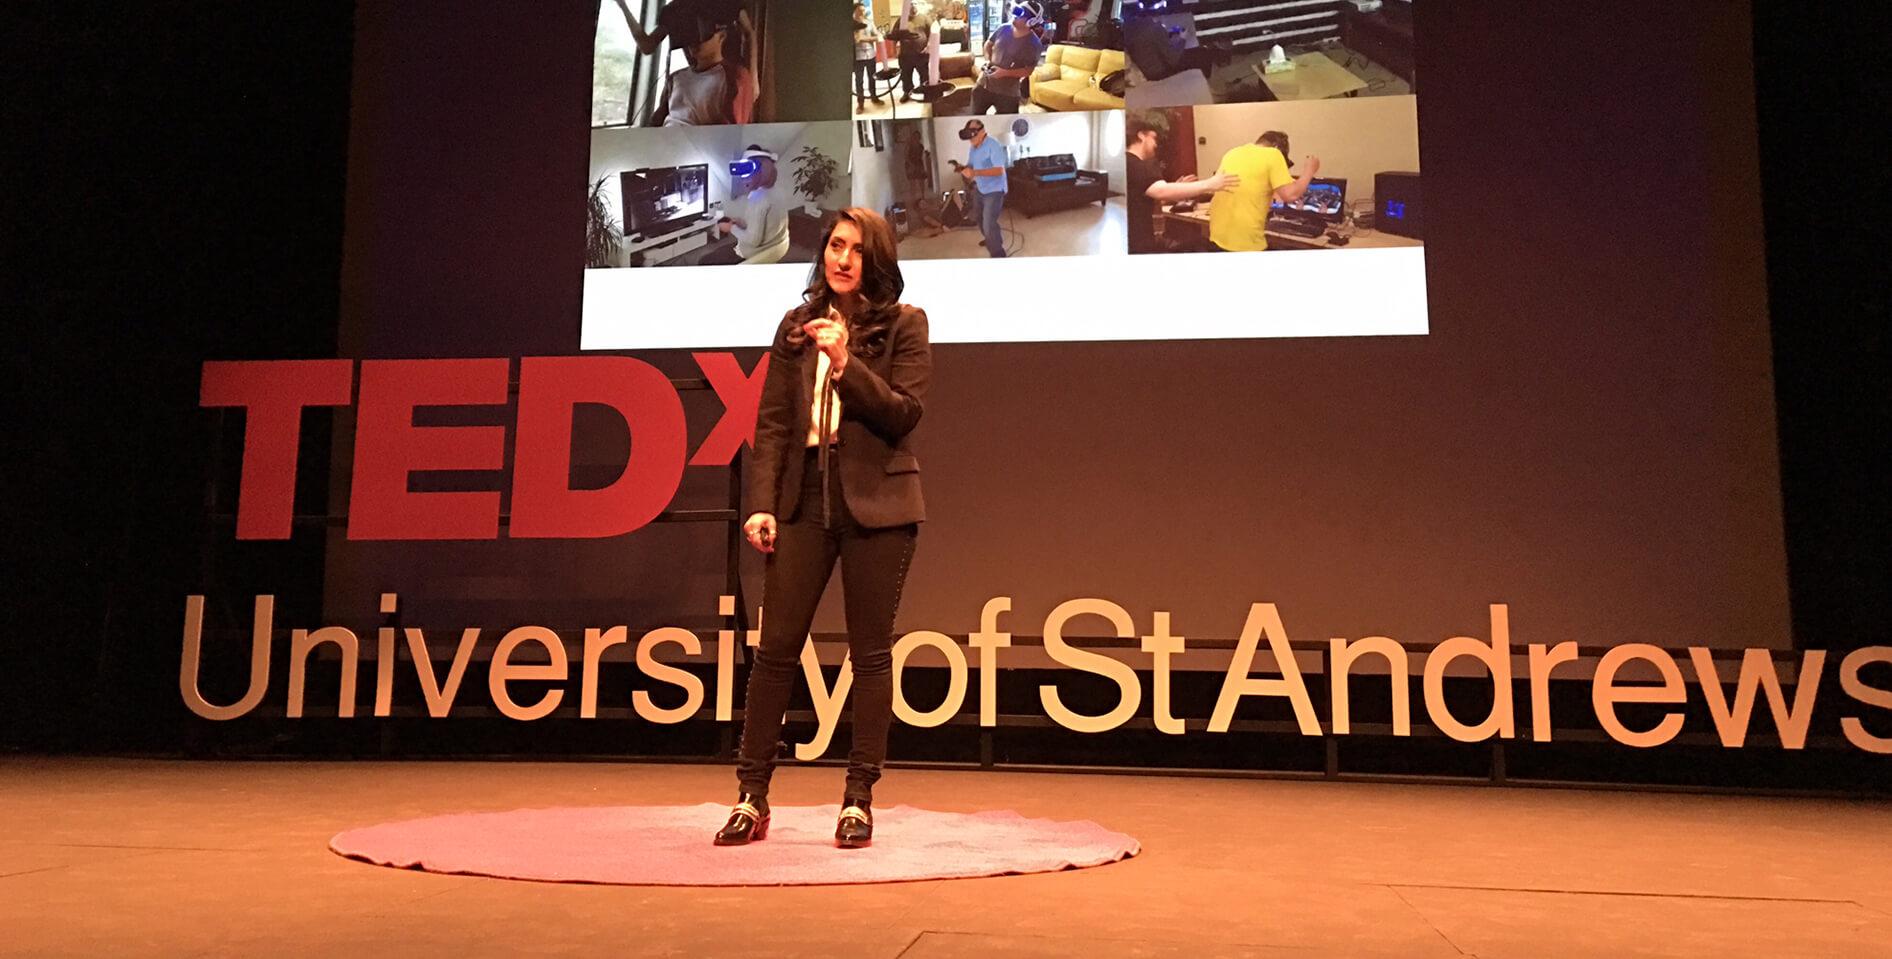 TEDx Virtual Reality Talk